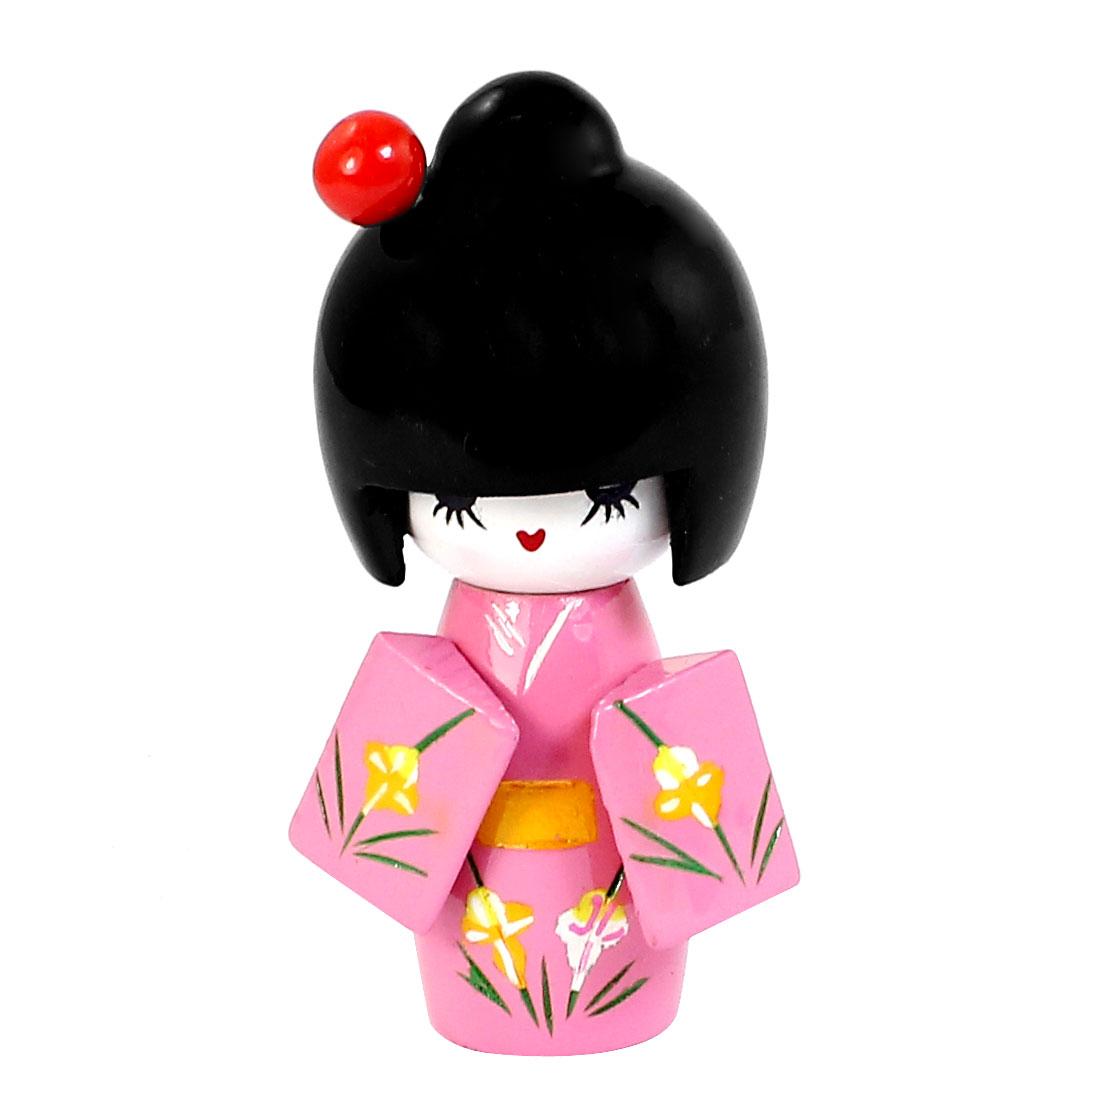 8cm Length Craft Flower Pattern Kimono Japanese Wooden Kokeshi Girl Doll Pink